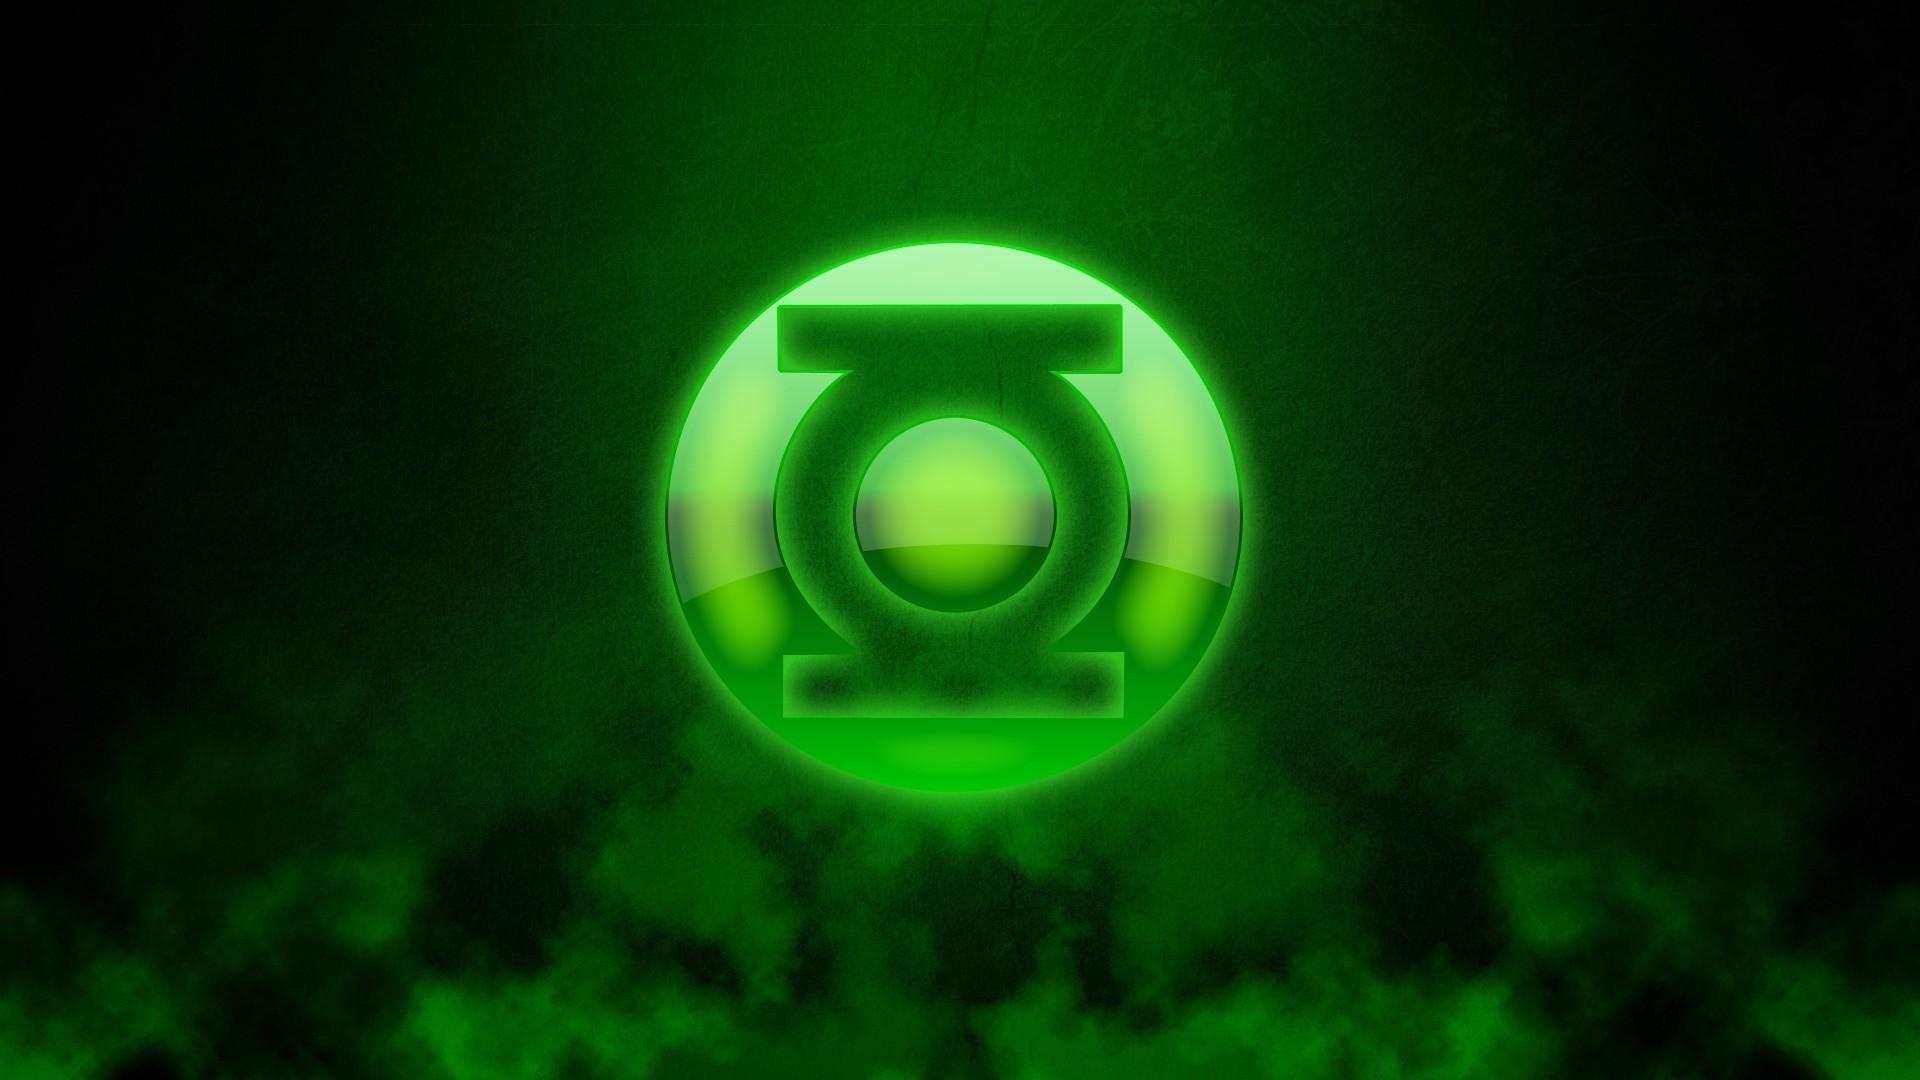 An Upcoming Green Lantern Green Arrow Movie (2015)